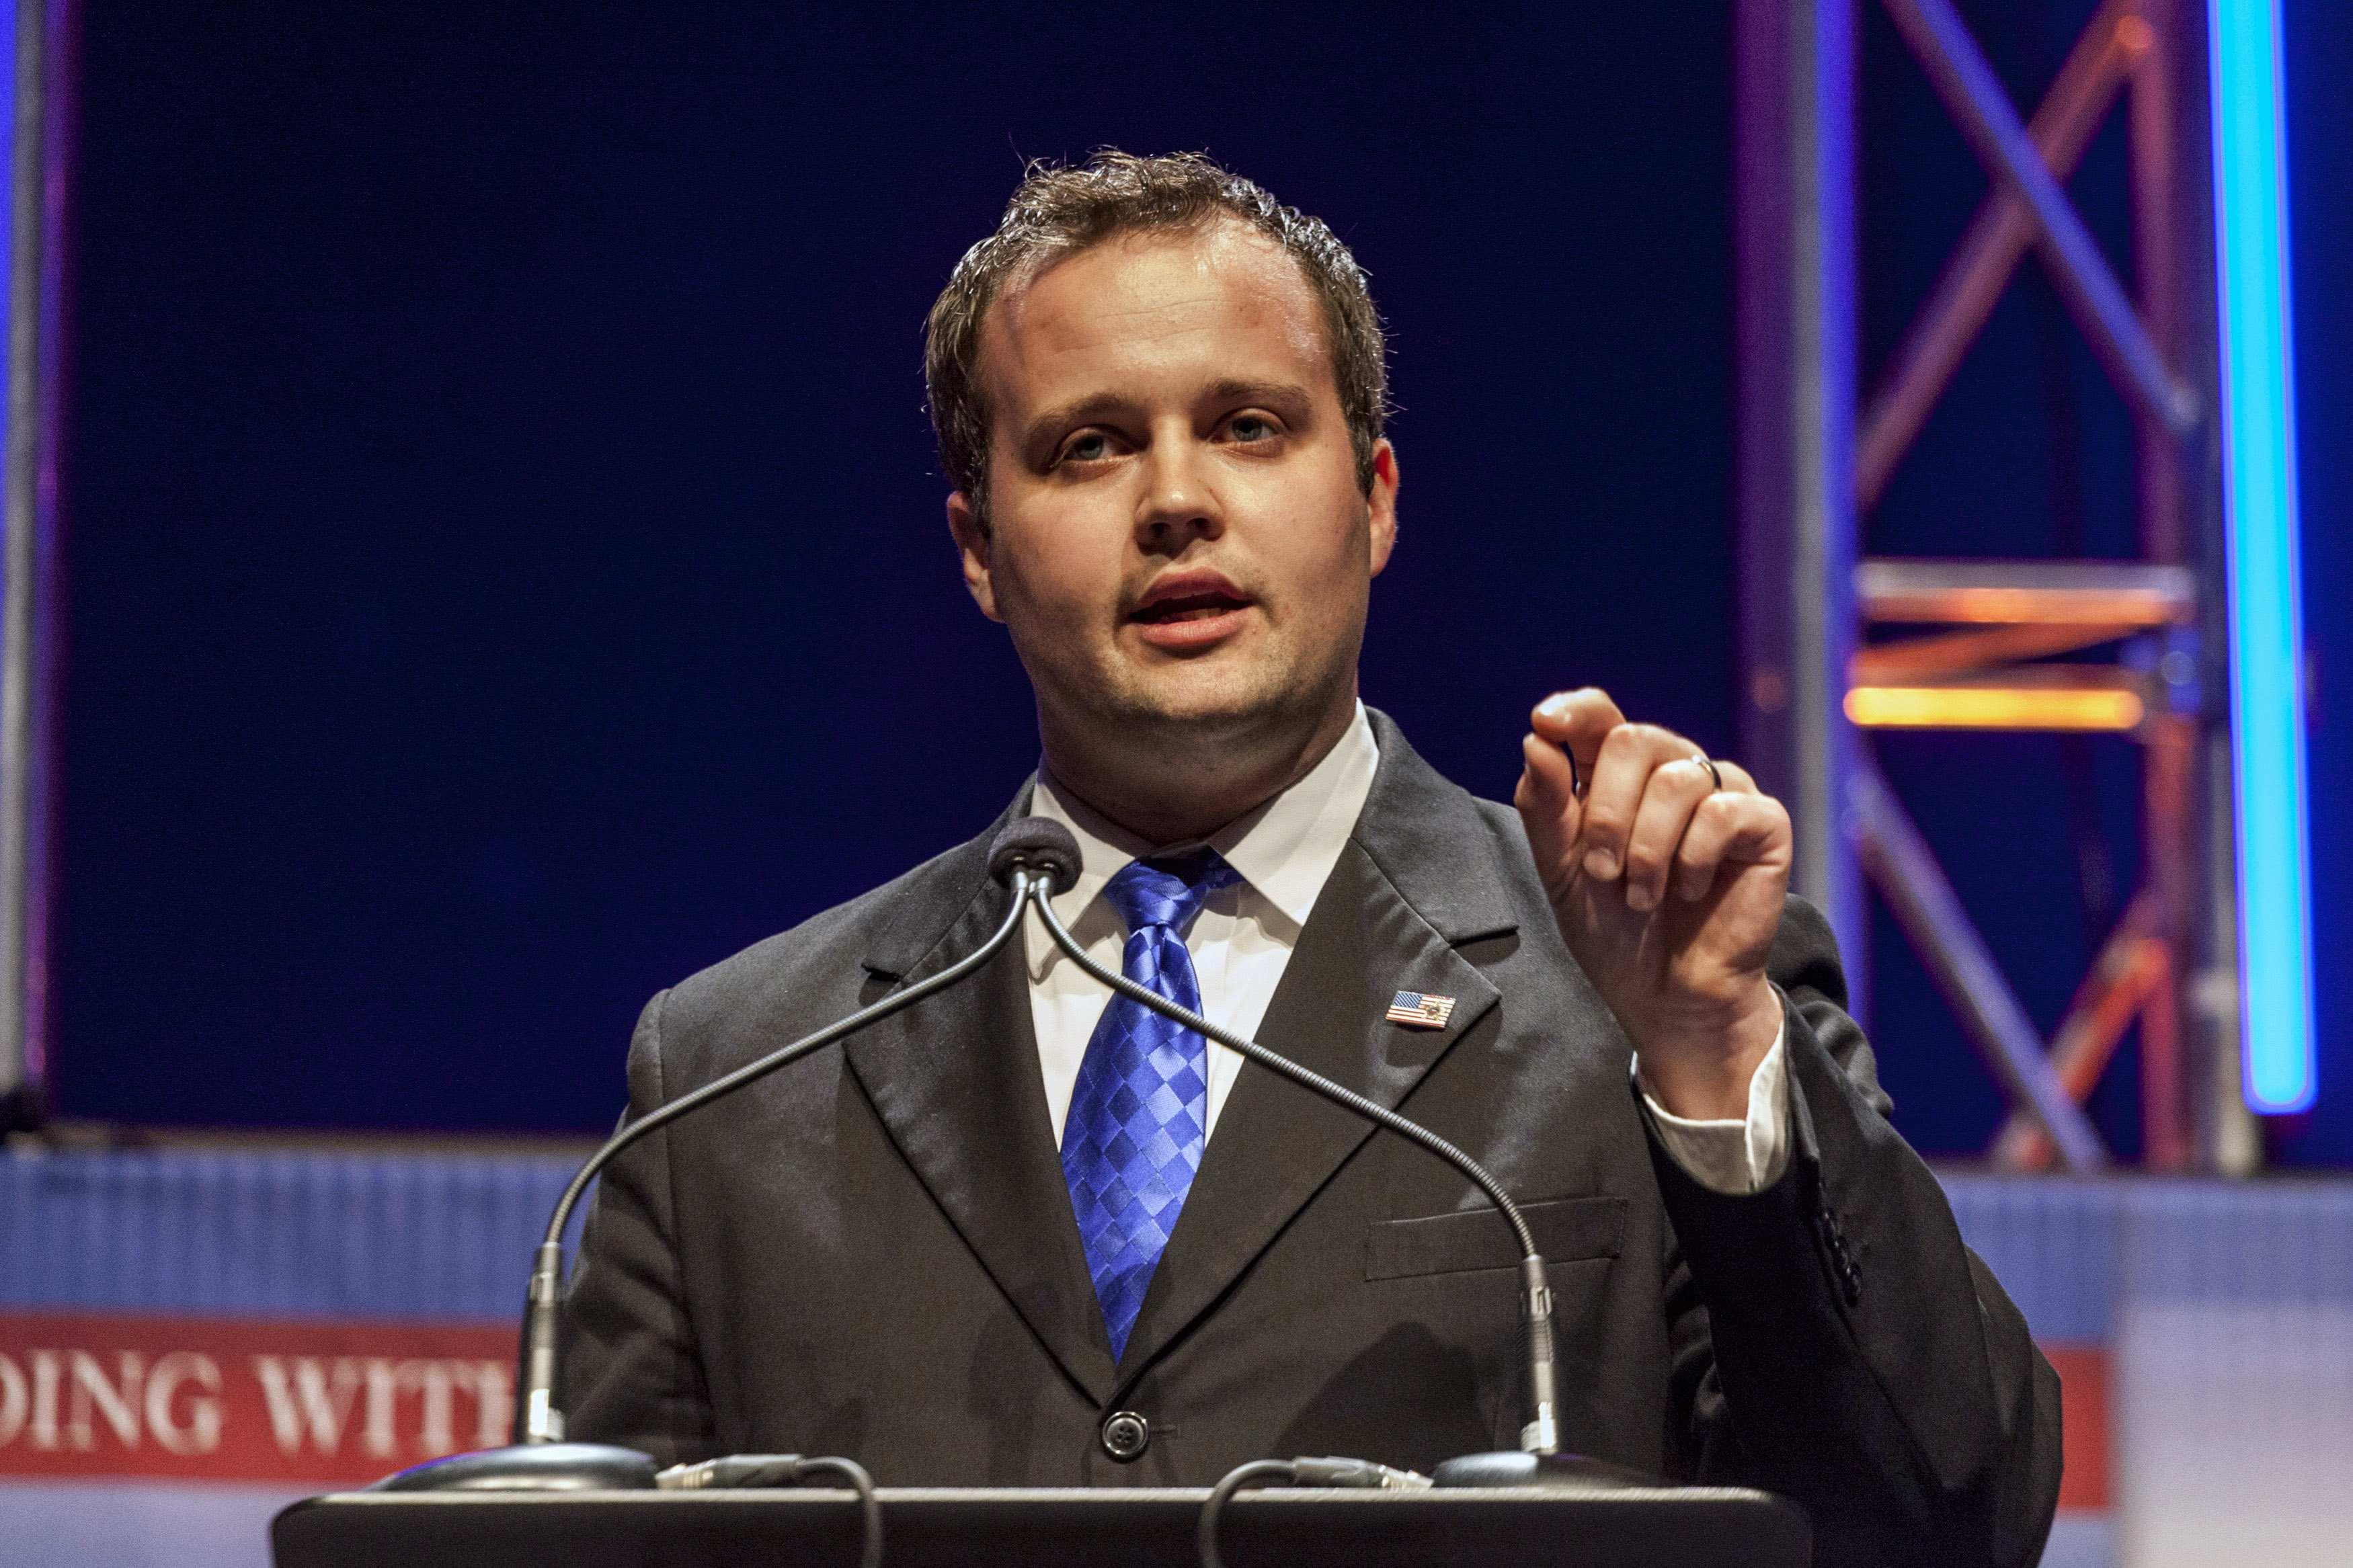 GOP presidential candidate defends Josh Duggar